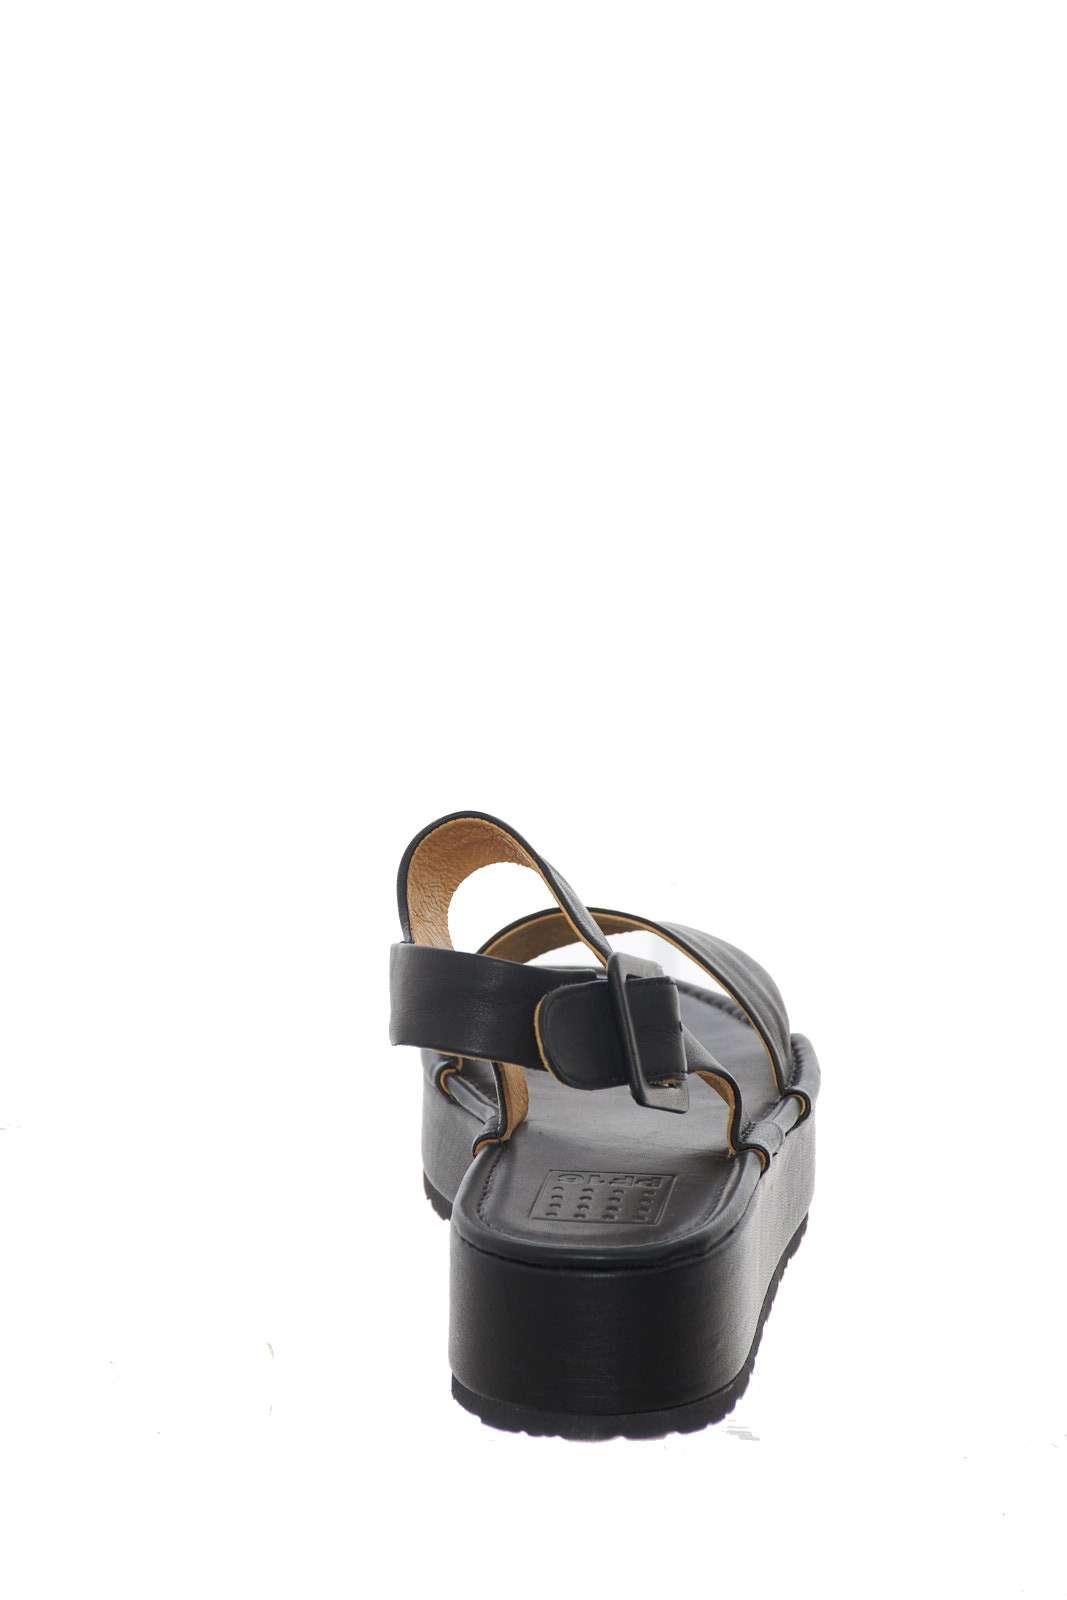 https://www.parmax.com/media/catalog/product/a/i/PE-outlet_parmax-sandali-donna-PF16-1231-D.jpg